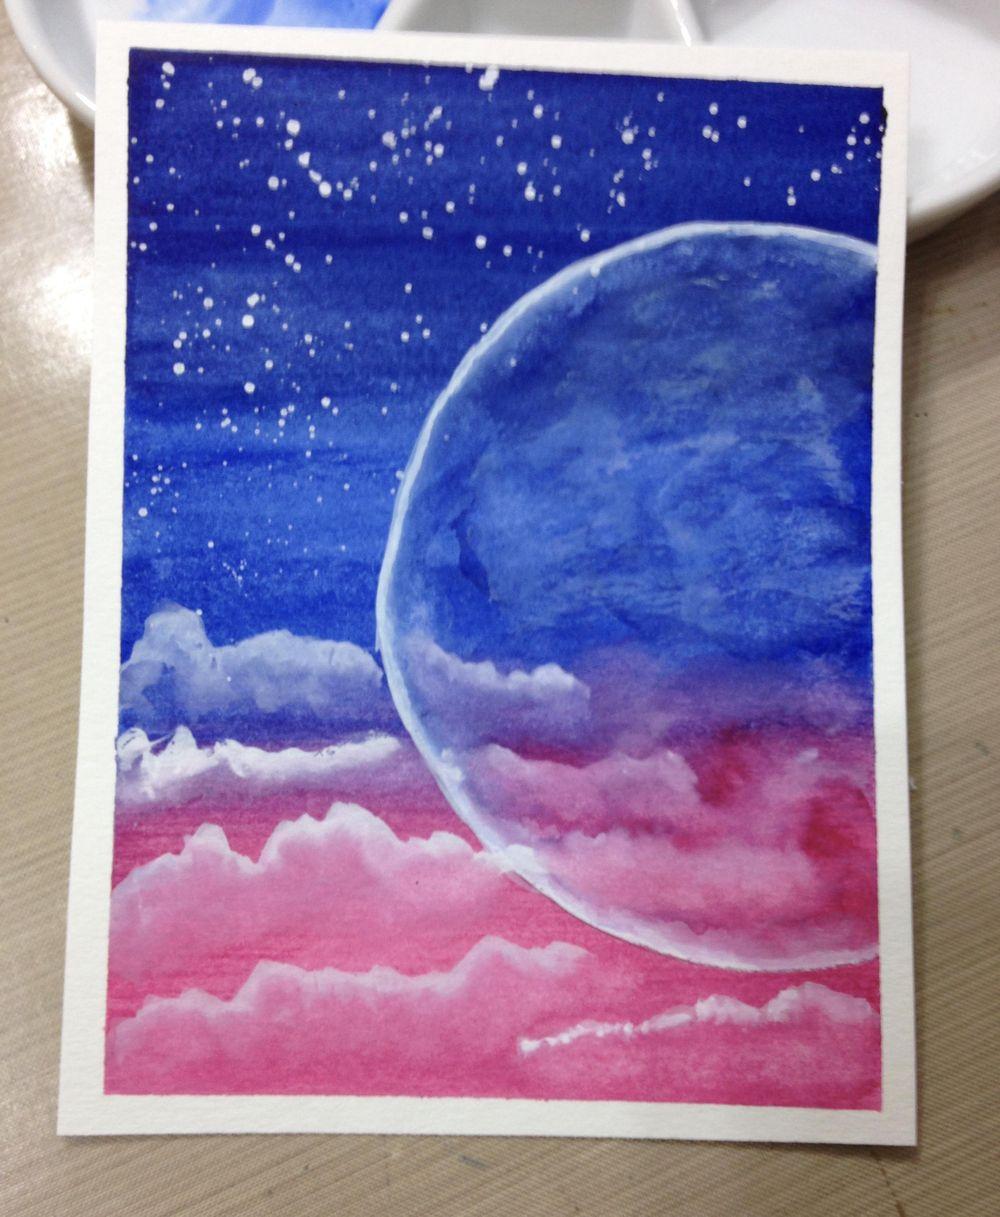 Luminous moon I - image 1 - student project